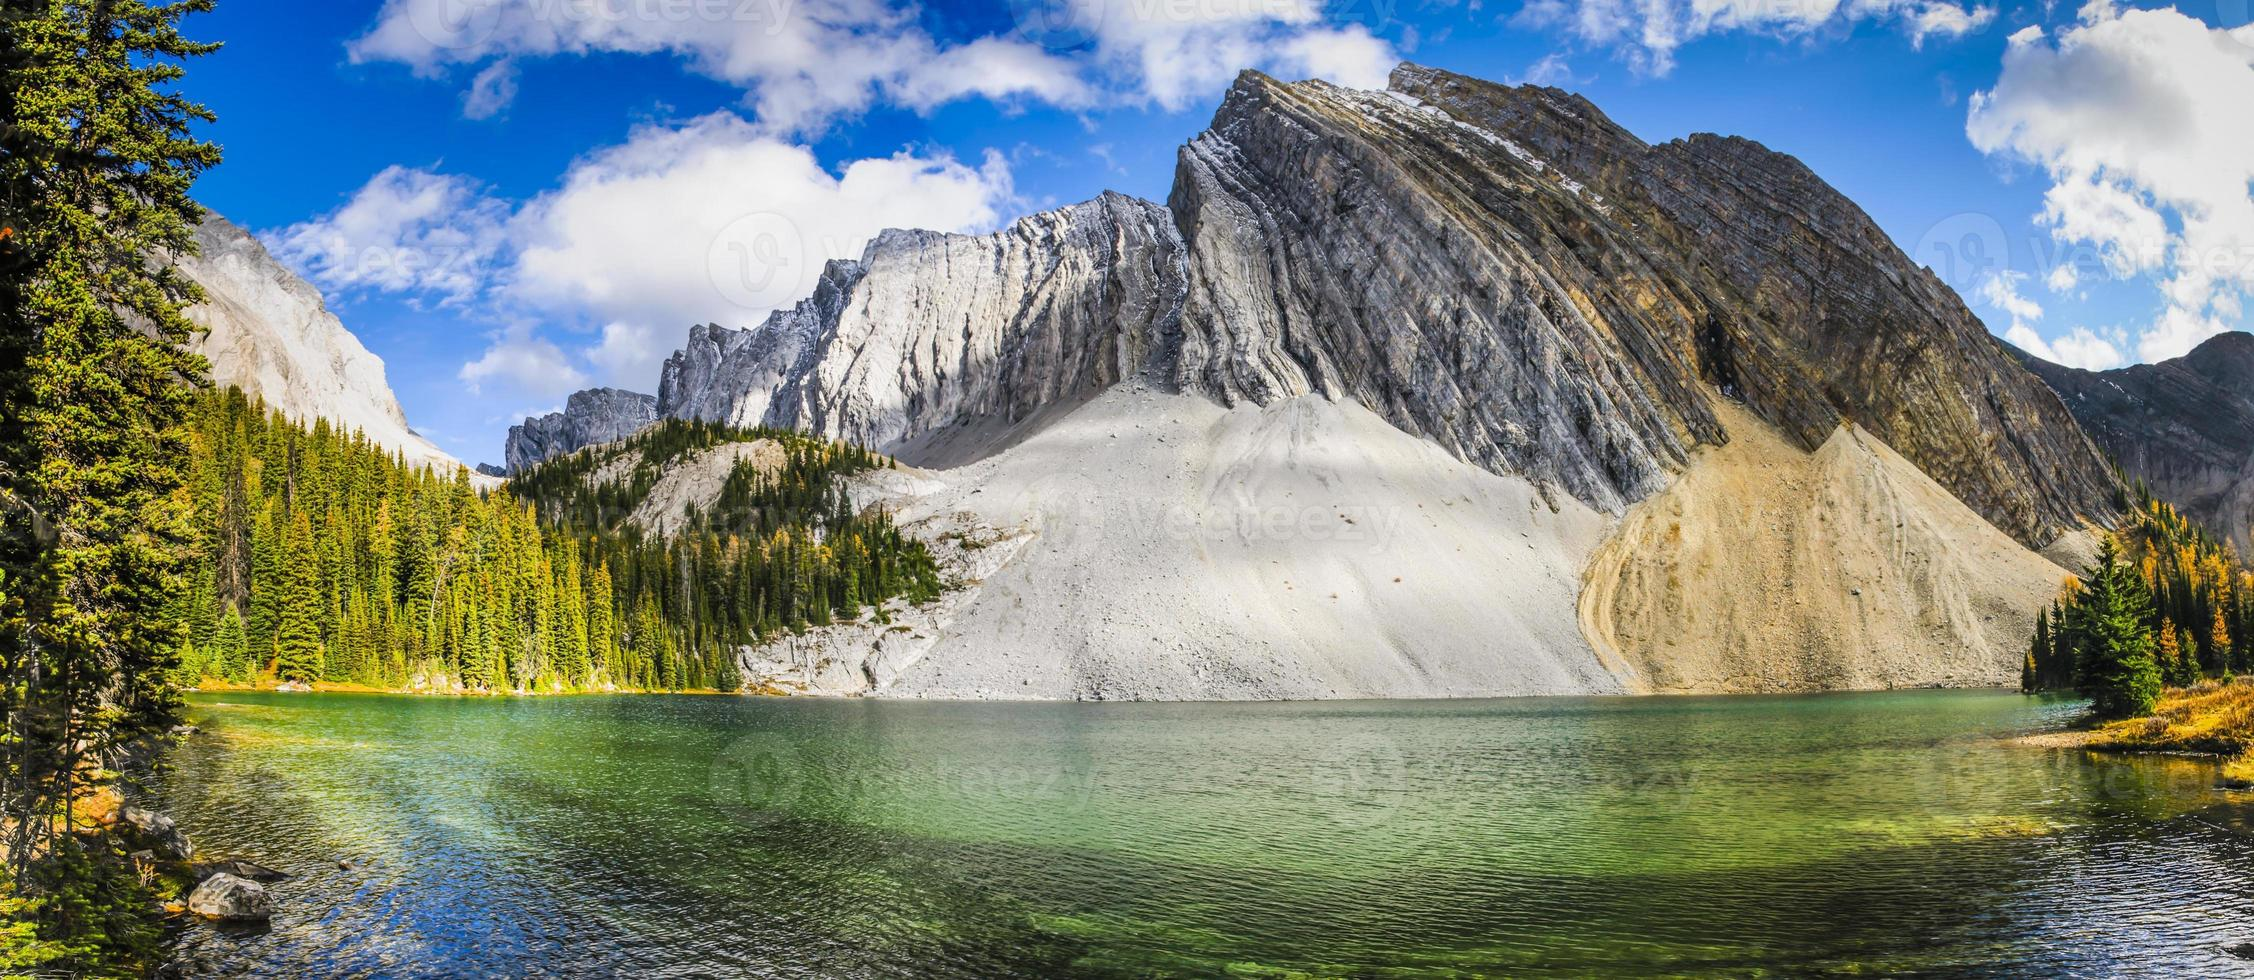 Beautiful fall mountain landscapes photo